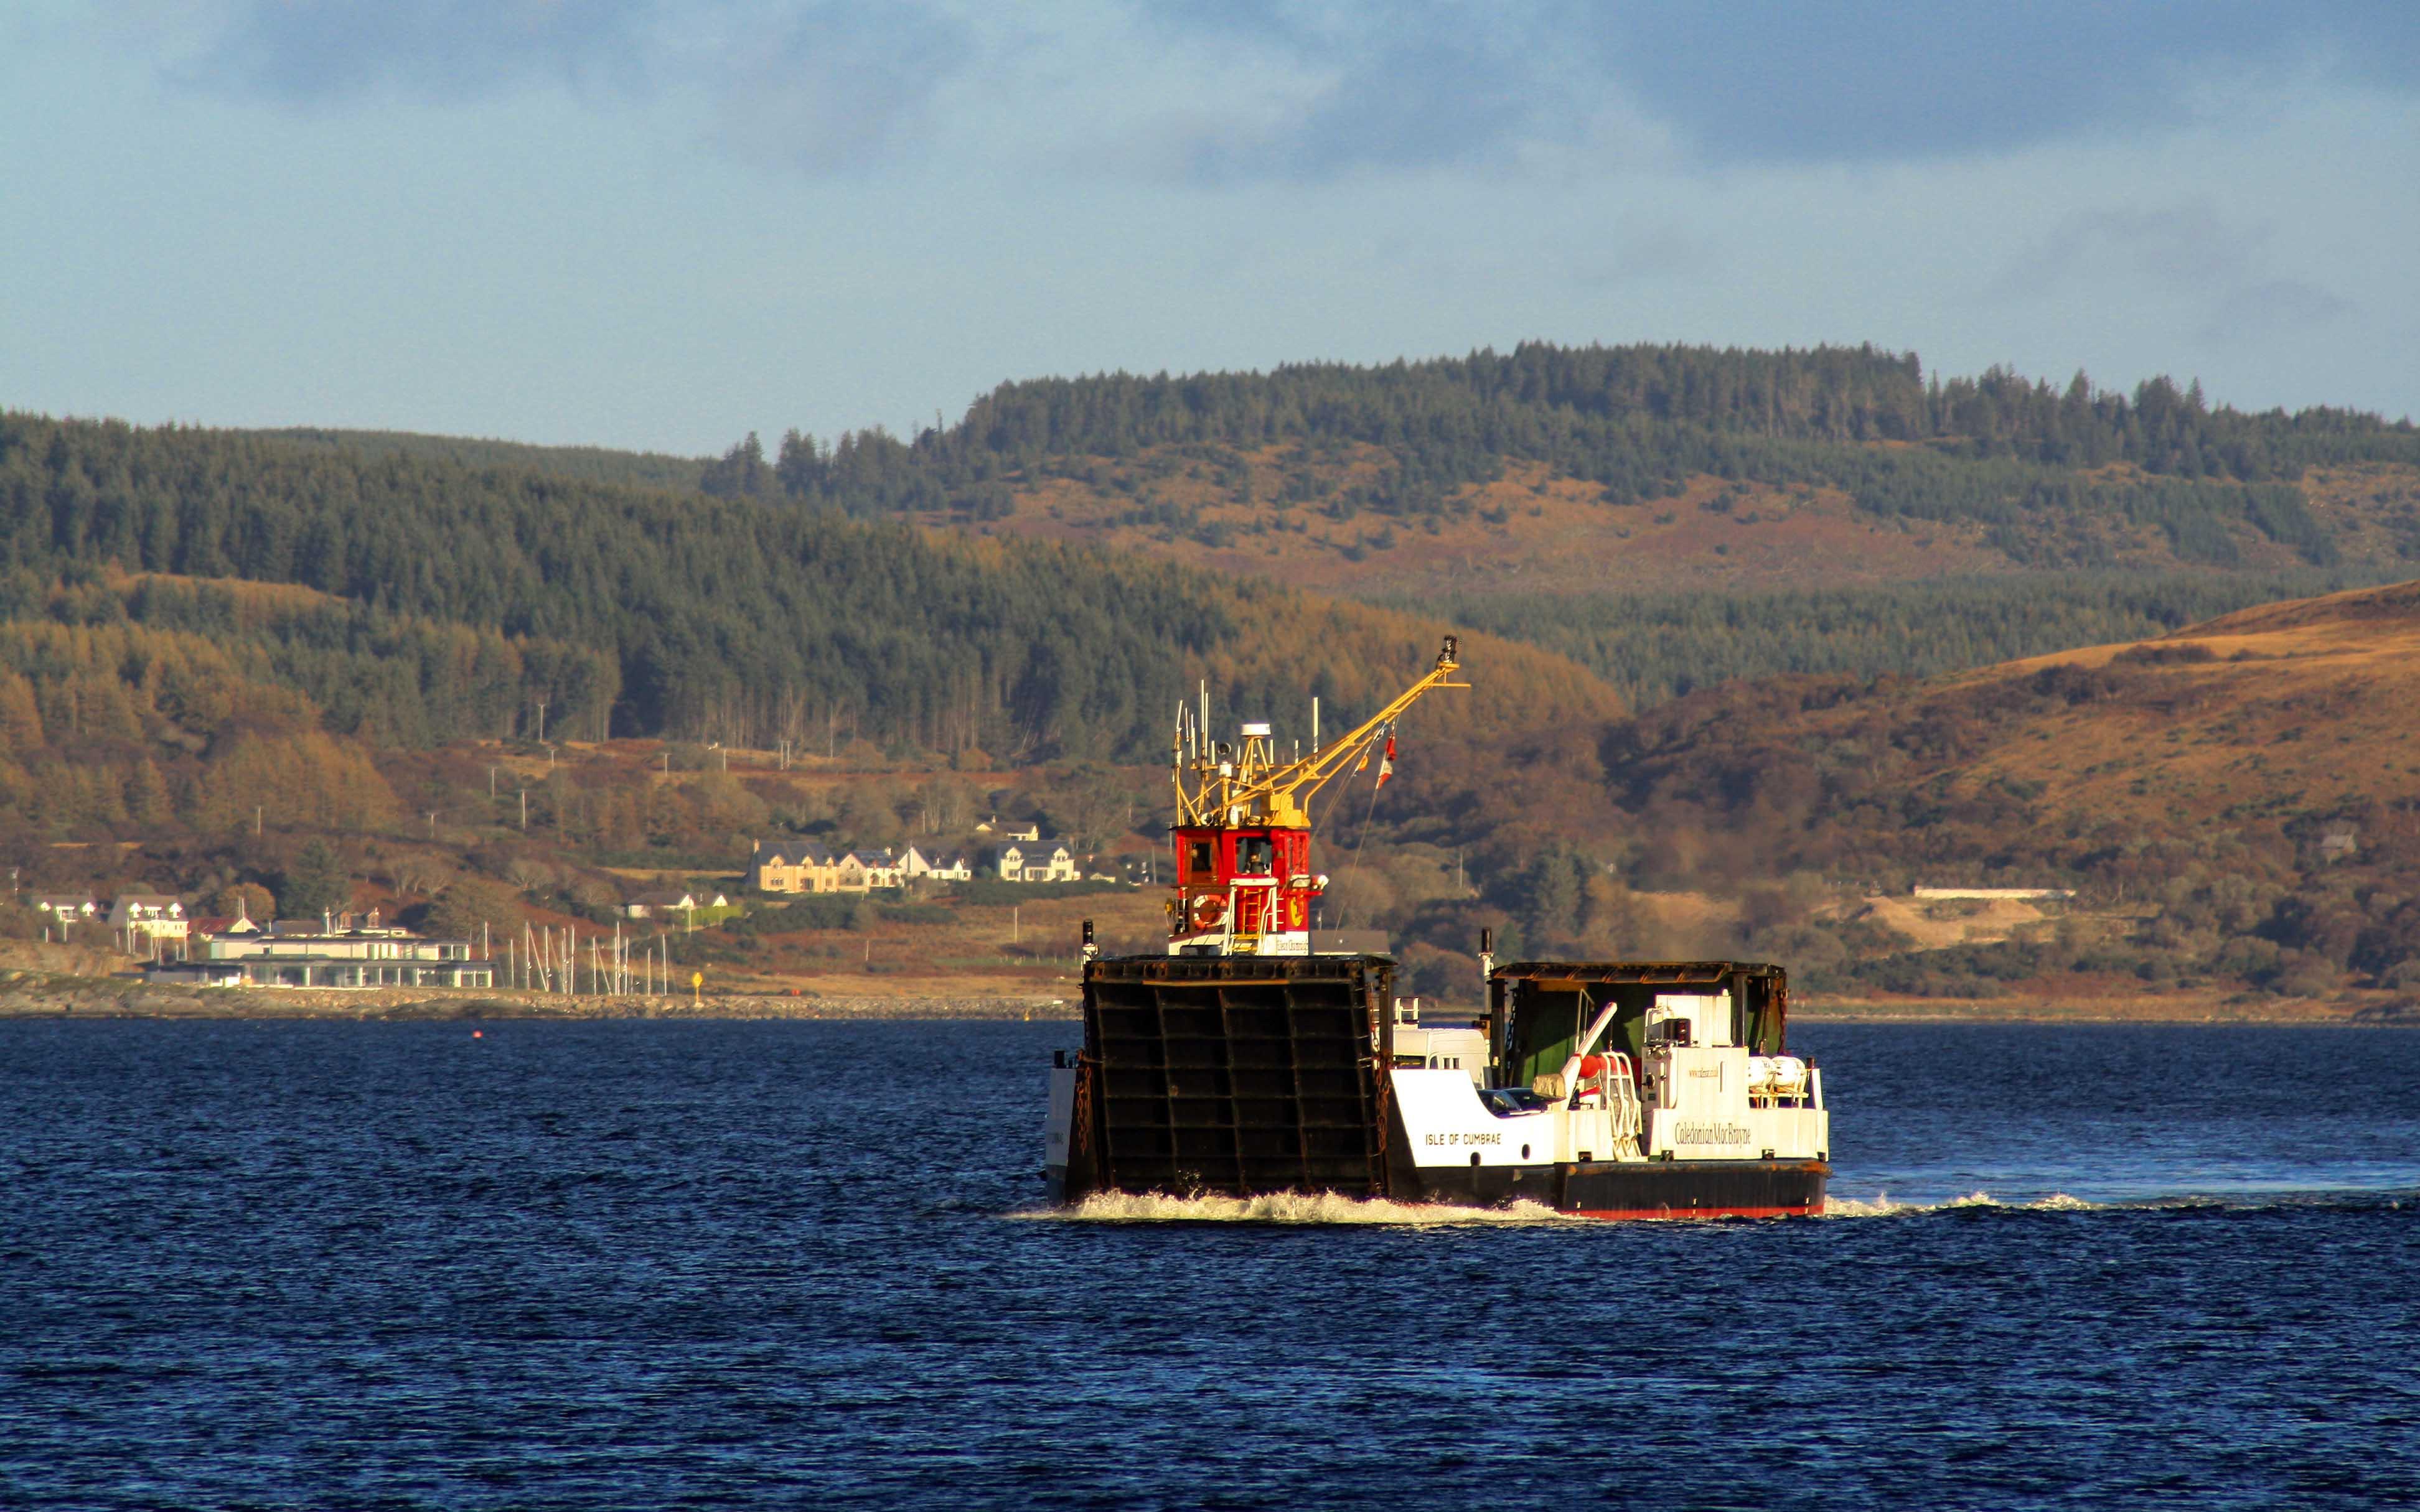 Isle of Cumbrae in Loch Fyne (Ships of CalMac)